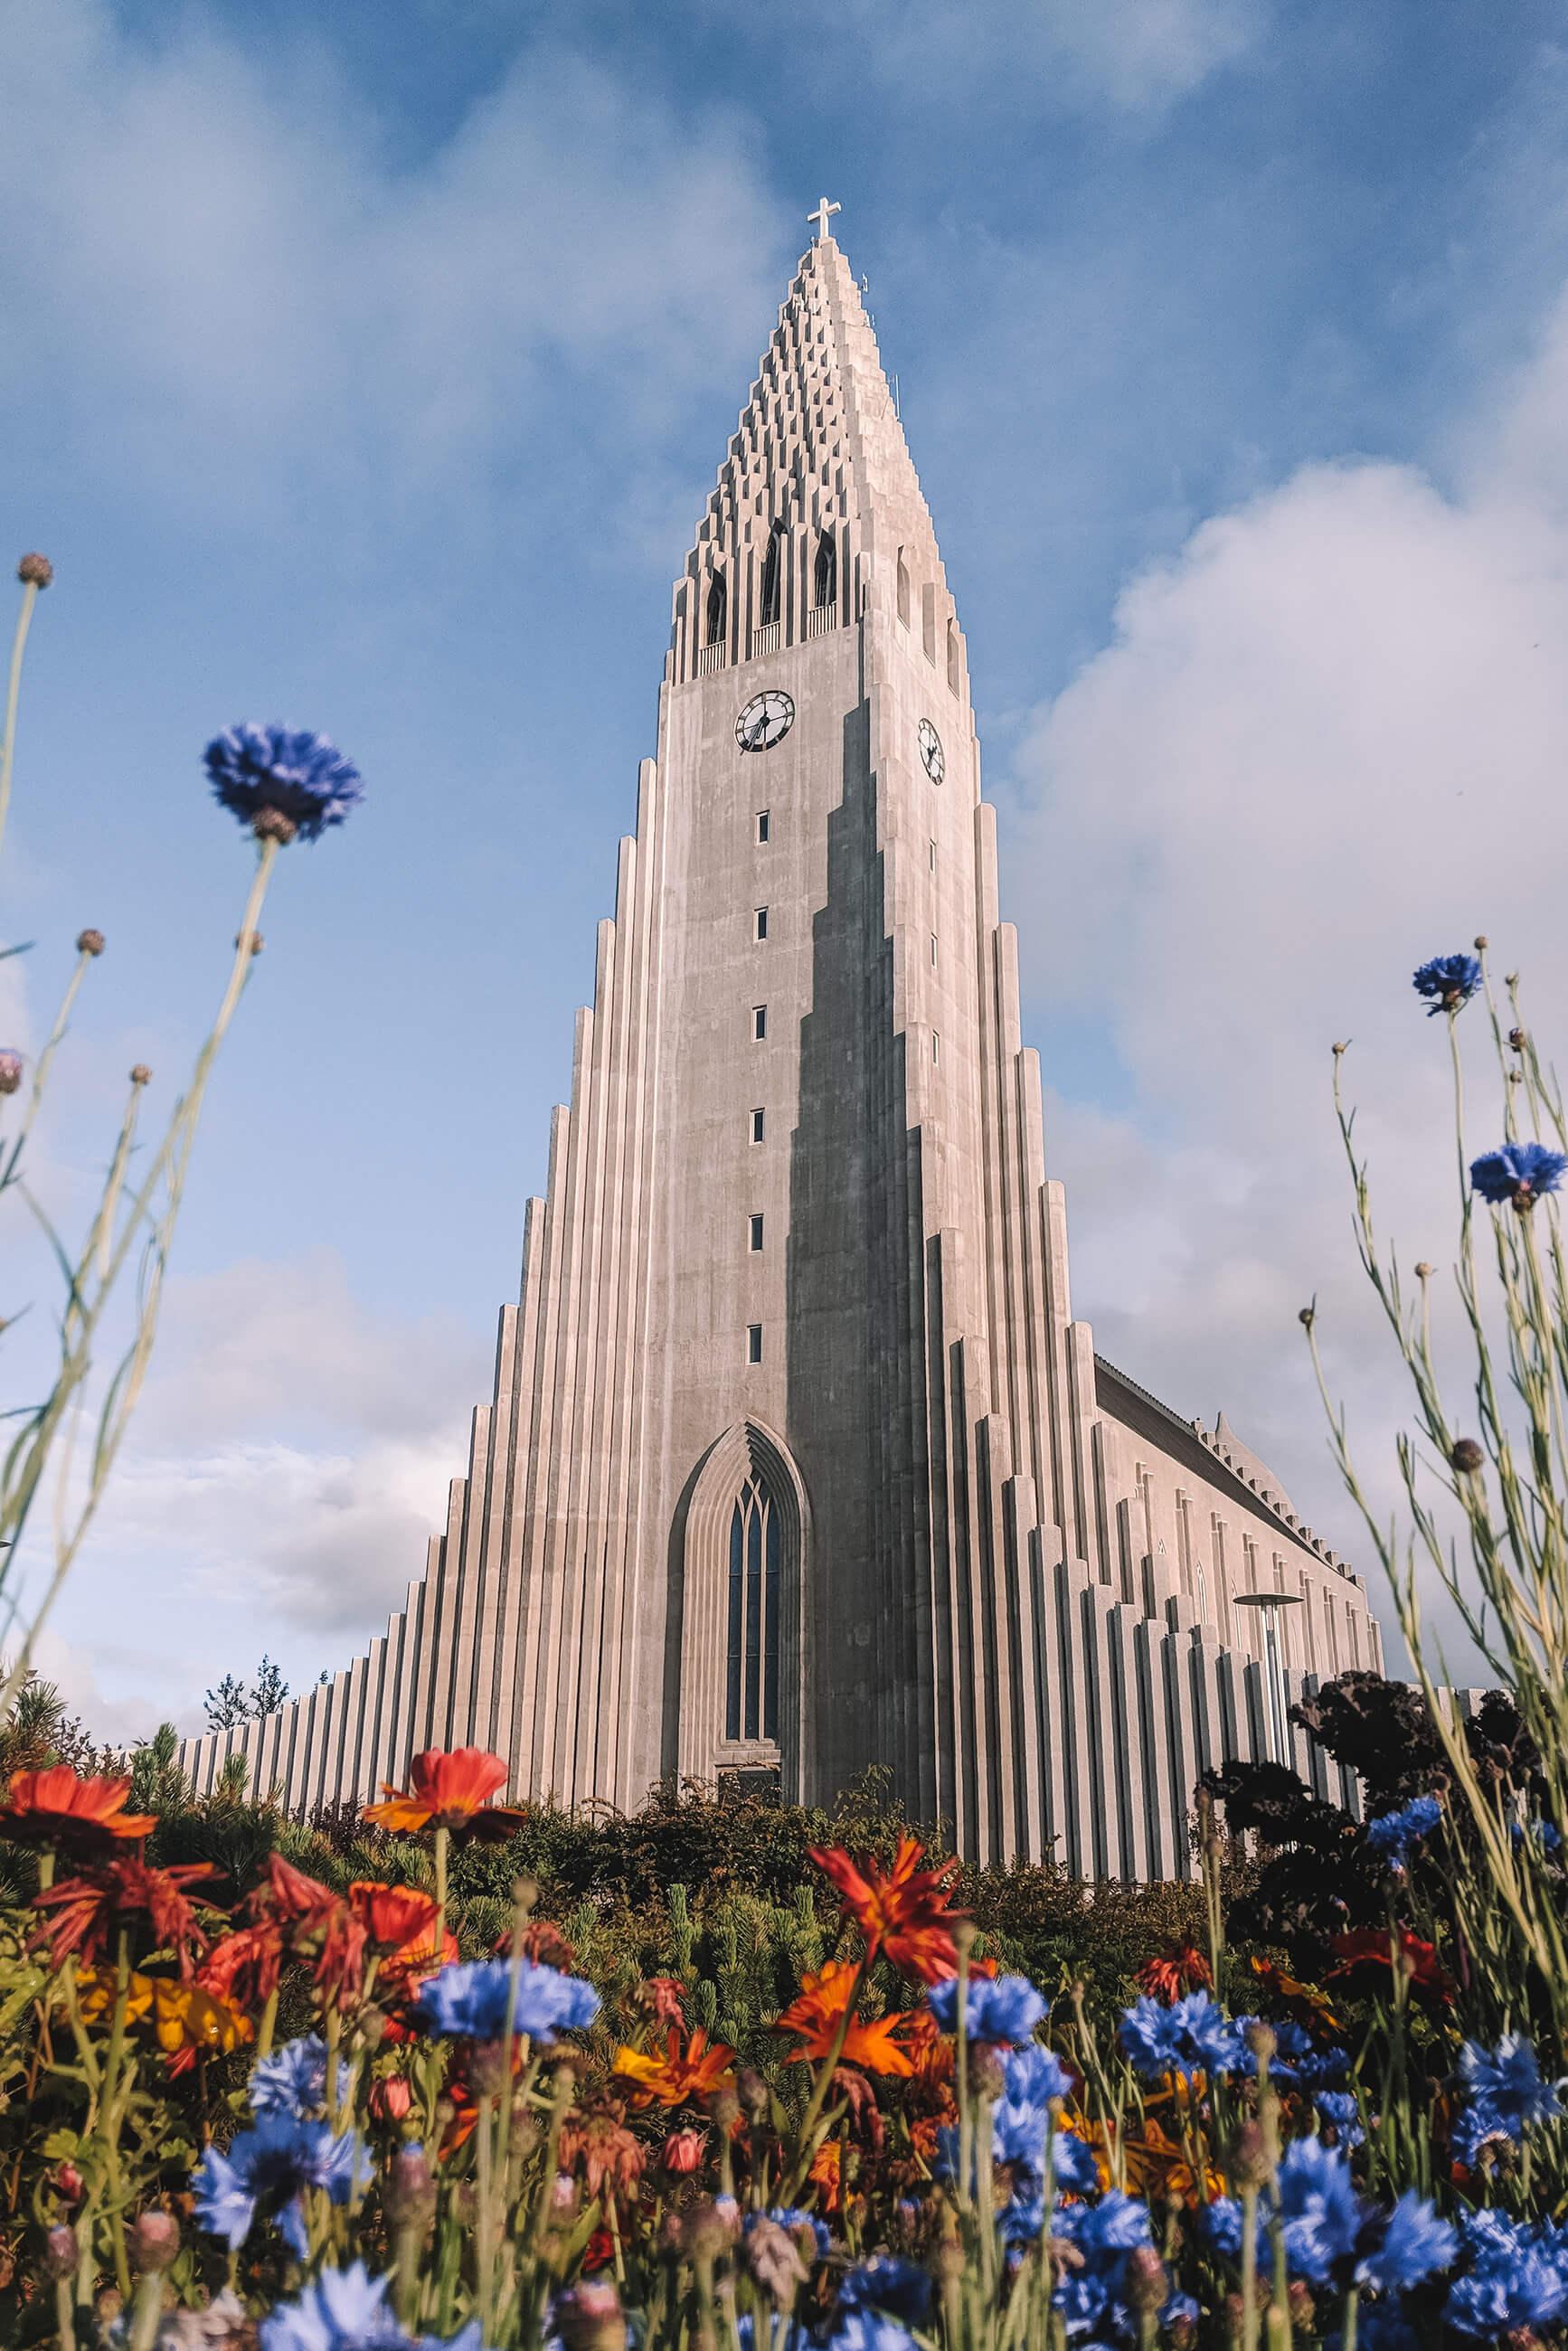 https://bubo.sk/uploads/galleries/5039/zuzkahabekova_island_reykjavik_kostol-2.jpg